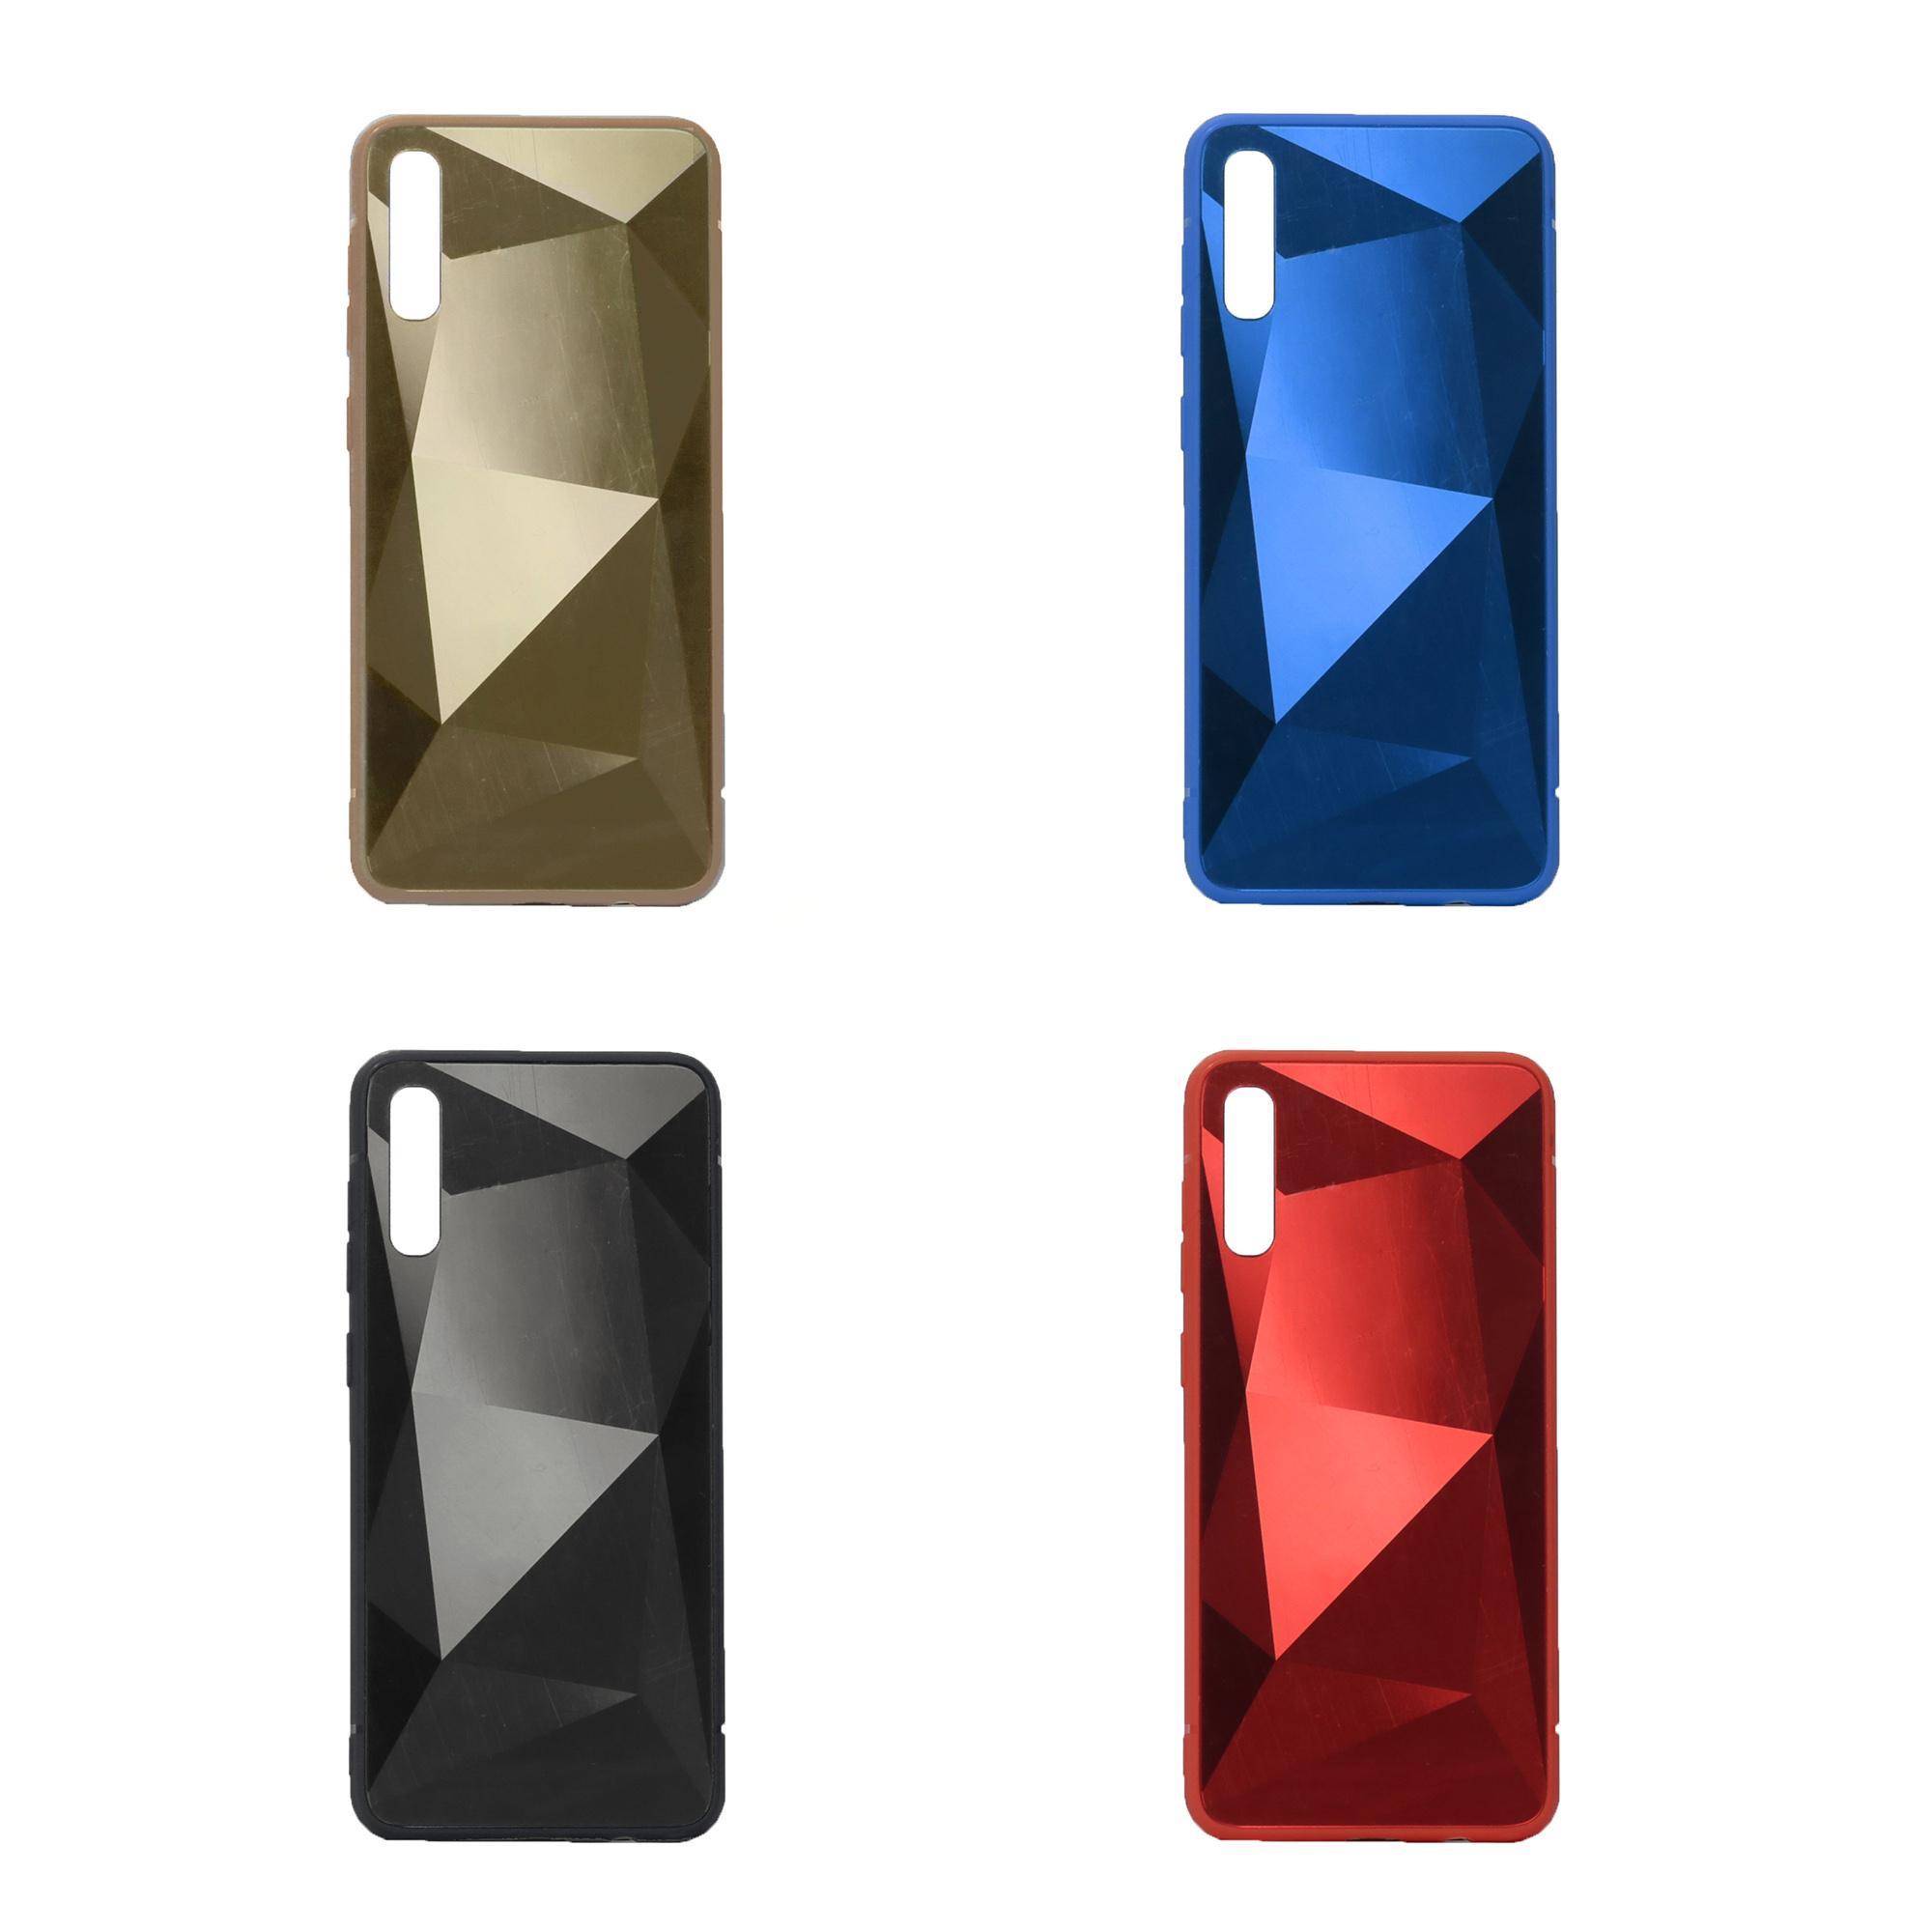 کاور طرح الماس مدل mr-506 مناسب برای گوشی موبایل سامسونگ Galaxy A50/A50s/a30s main 1 9